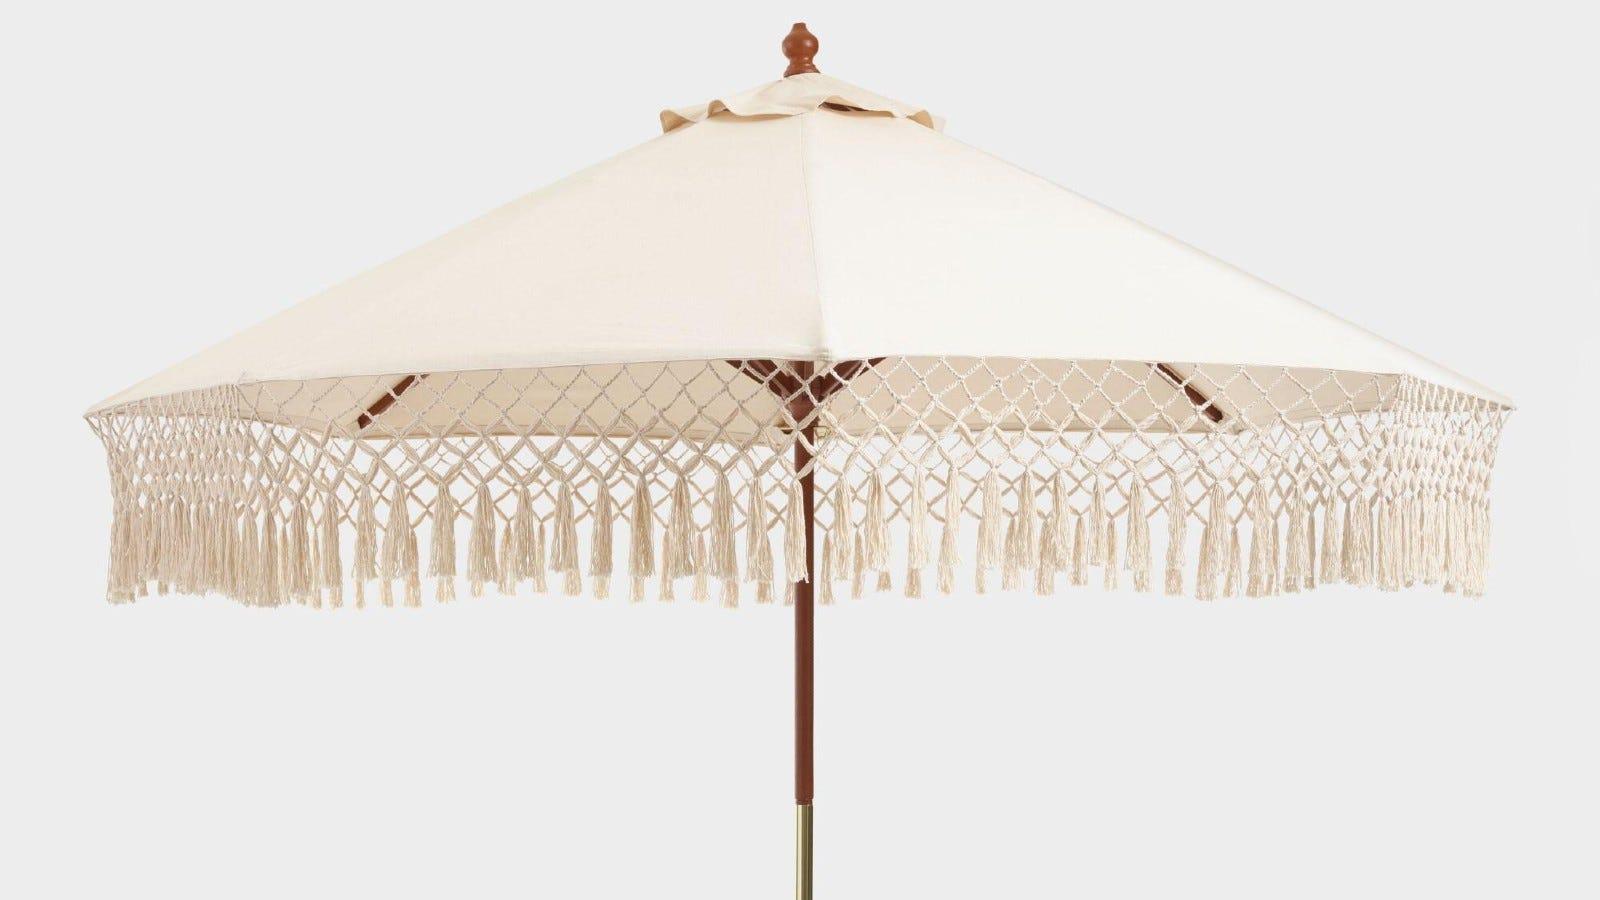 World Market Natural Umbrella Canopy with Fringe